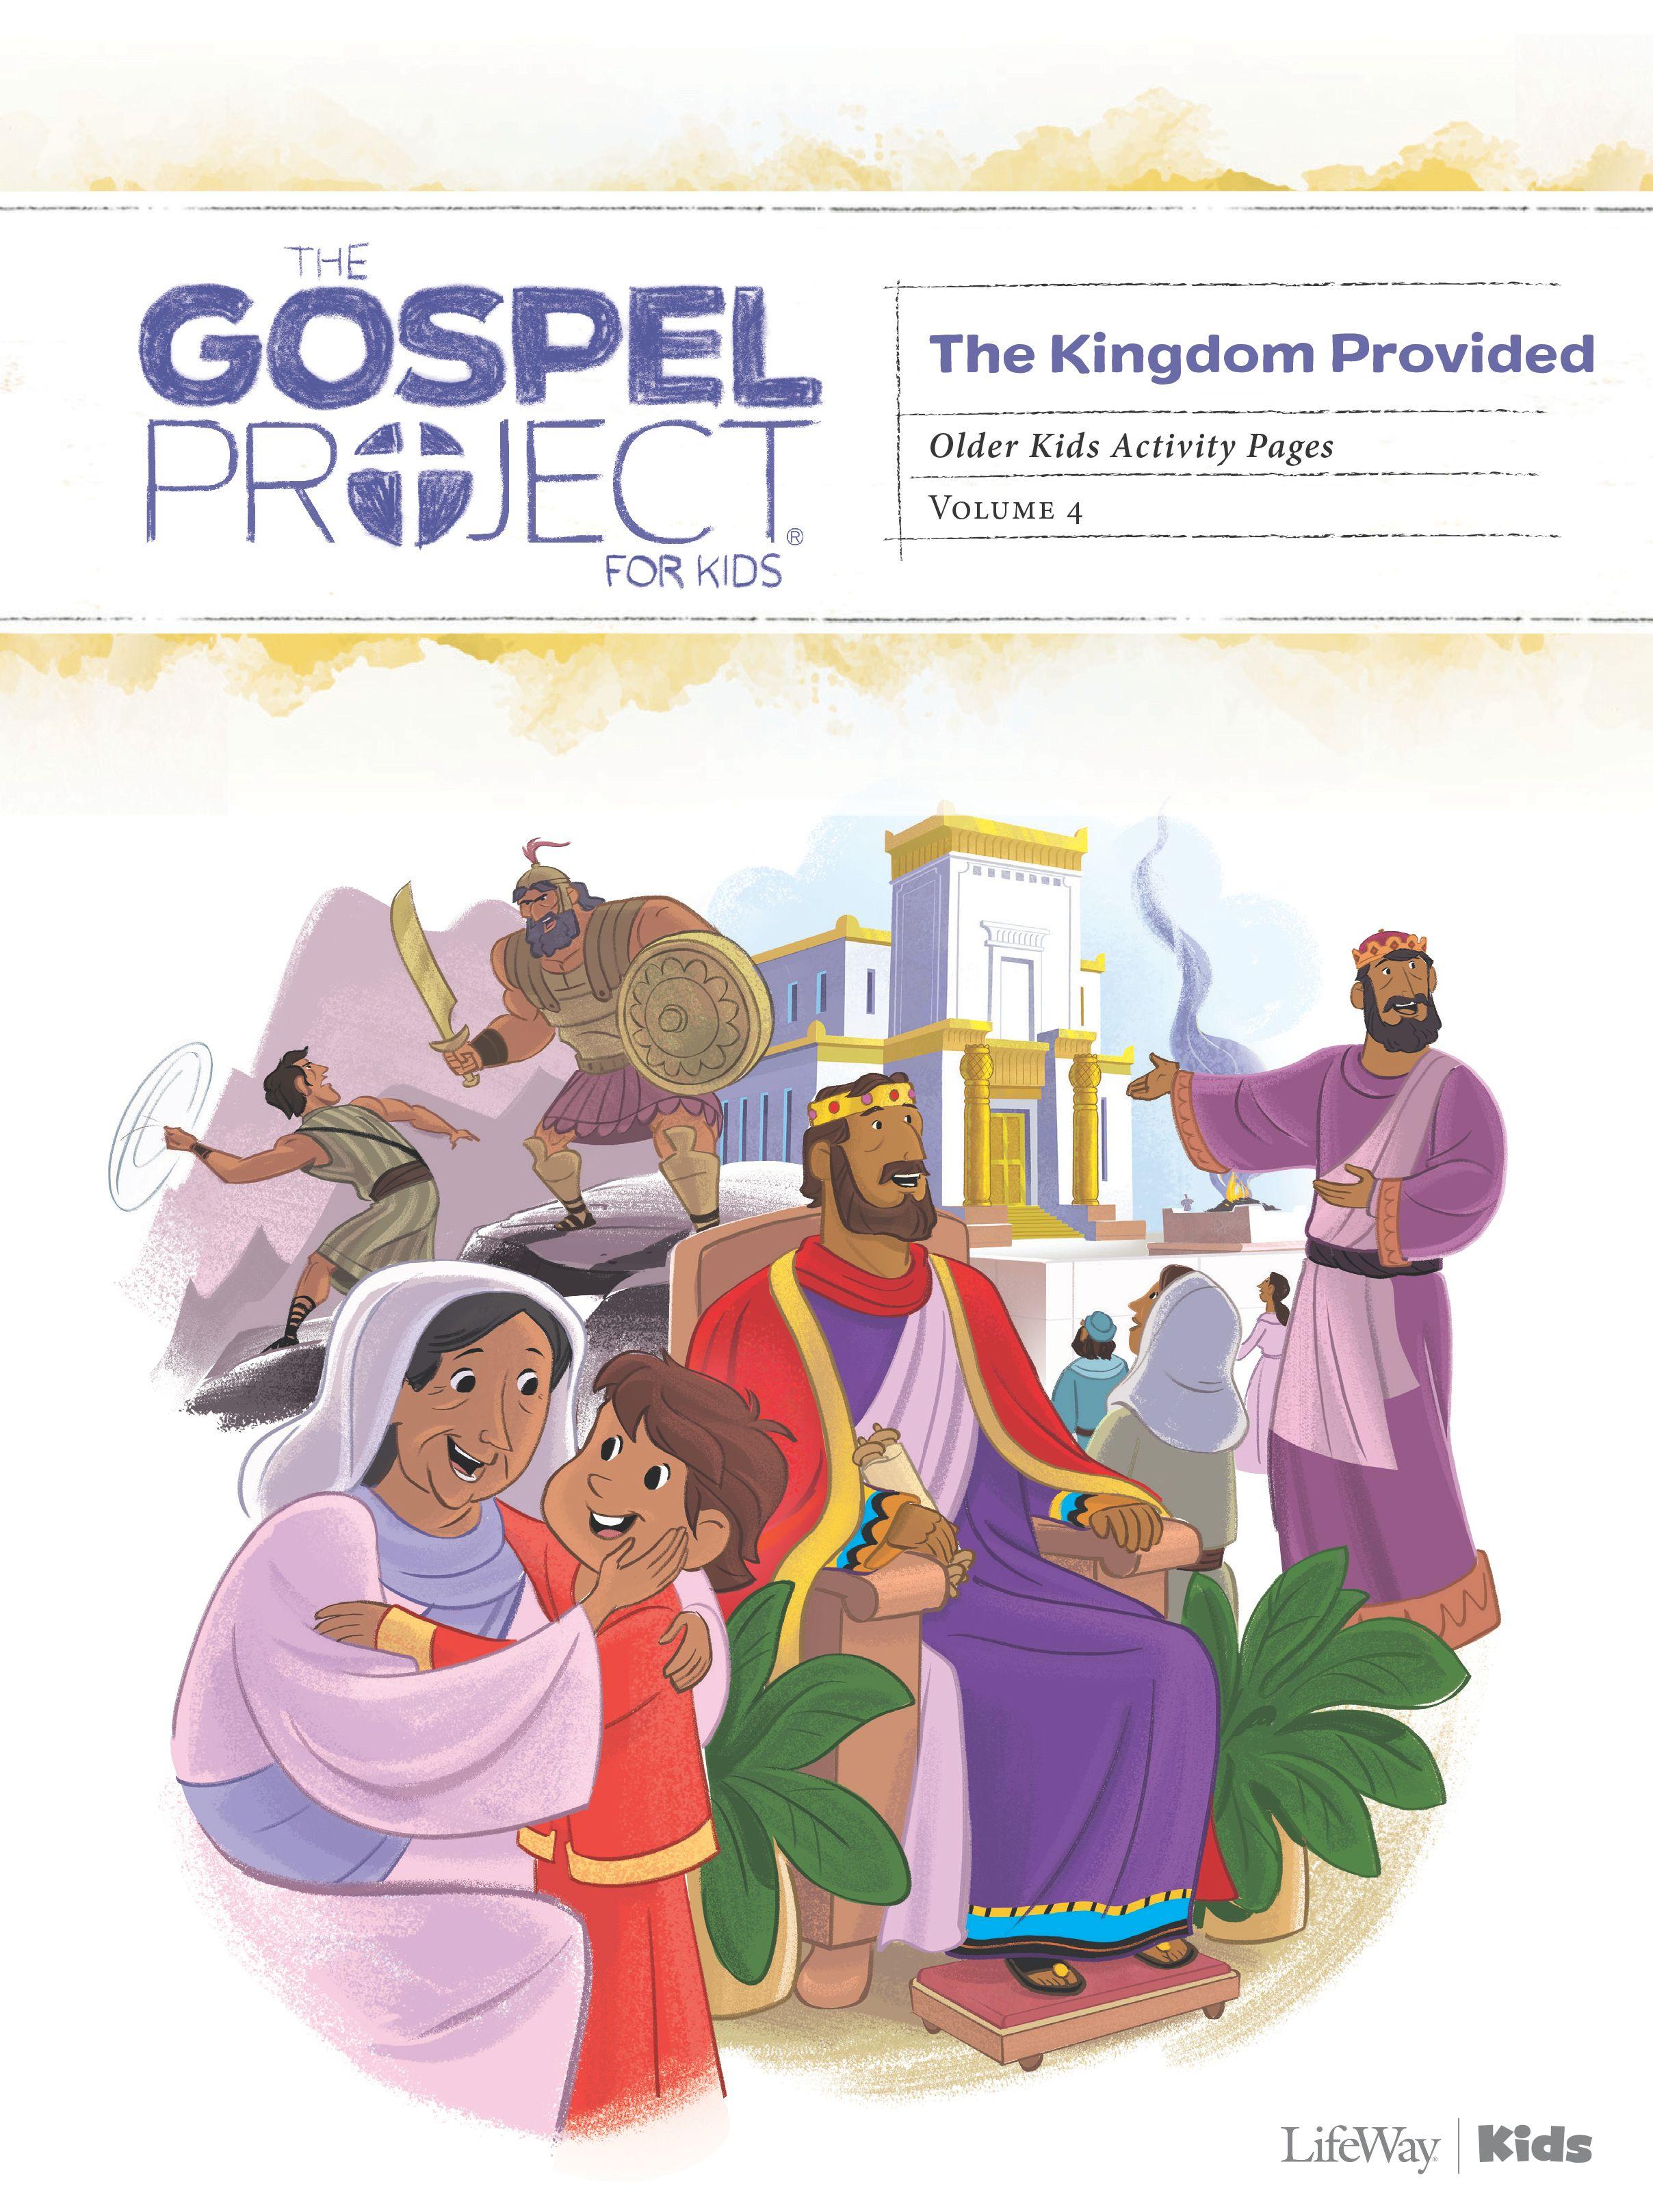 Volume 4: A Kingdom Provided